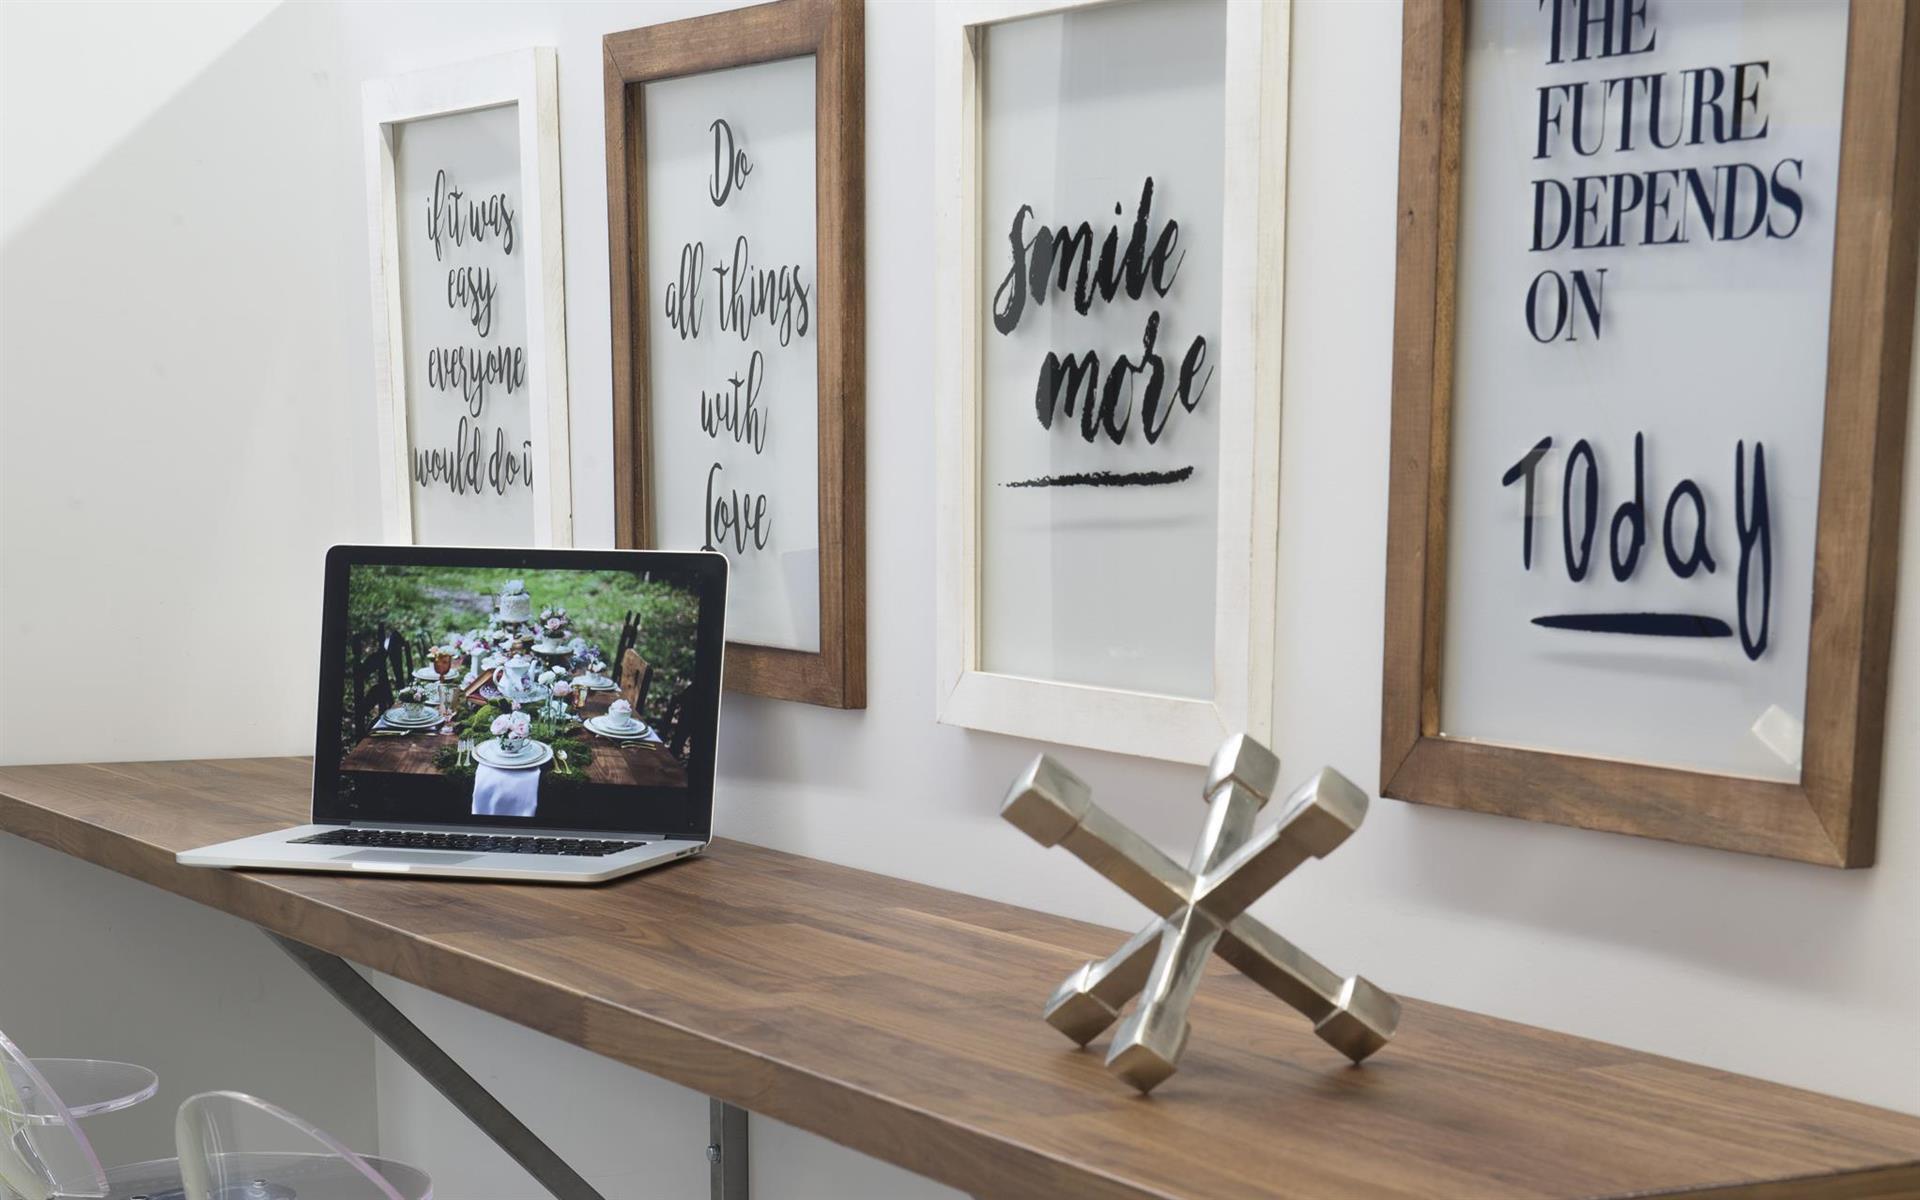 601 Vine Atelier | Studio, Meetings & CoWorking - Open Desk | Flexible Co-Working Space